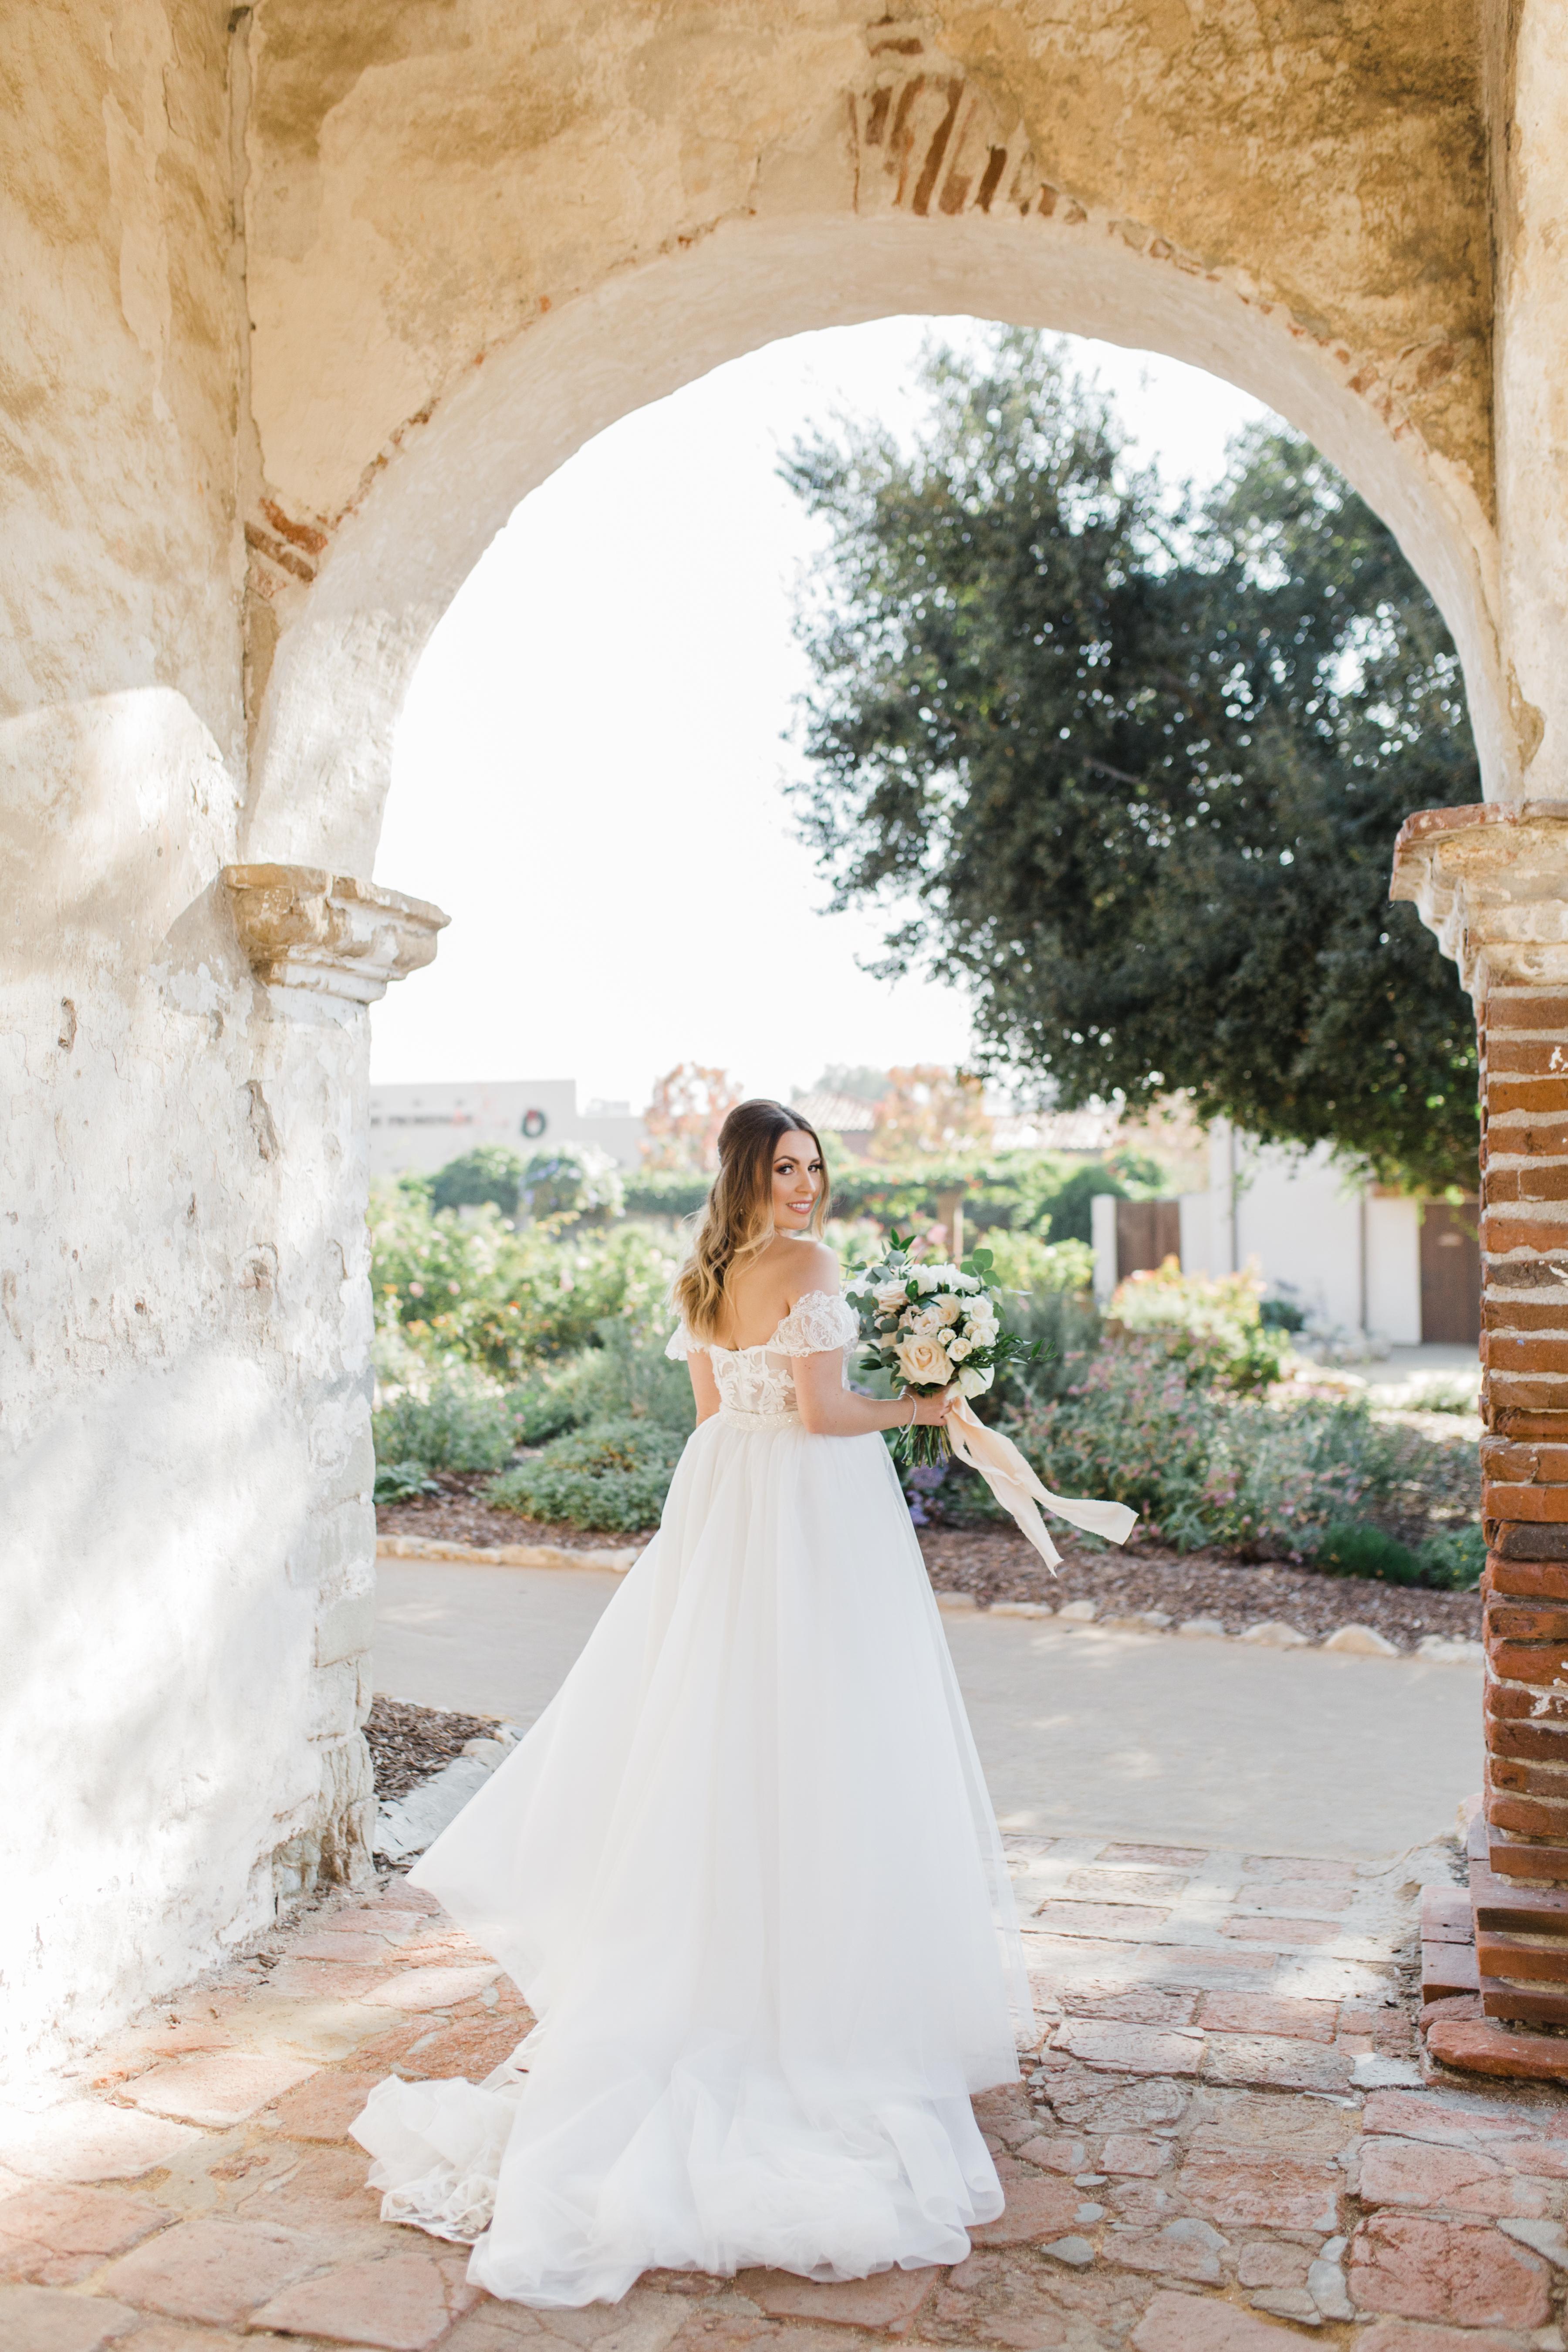 Jessica Lynn Photo | JenEvents